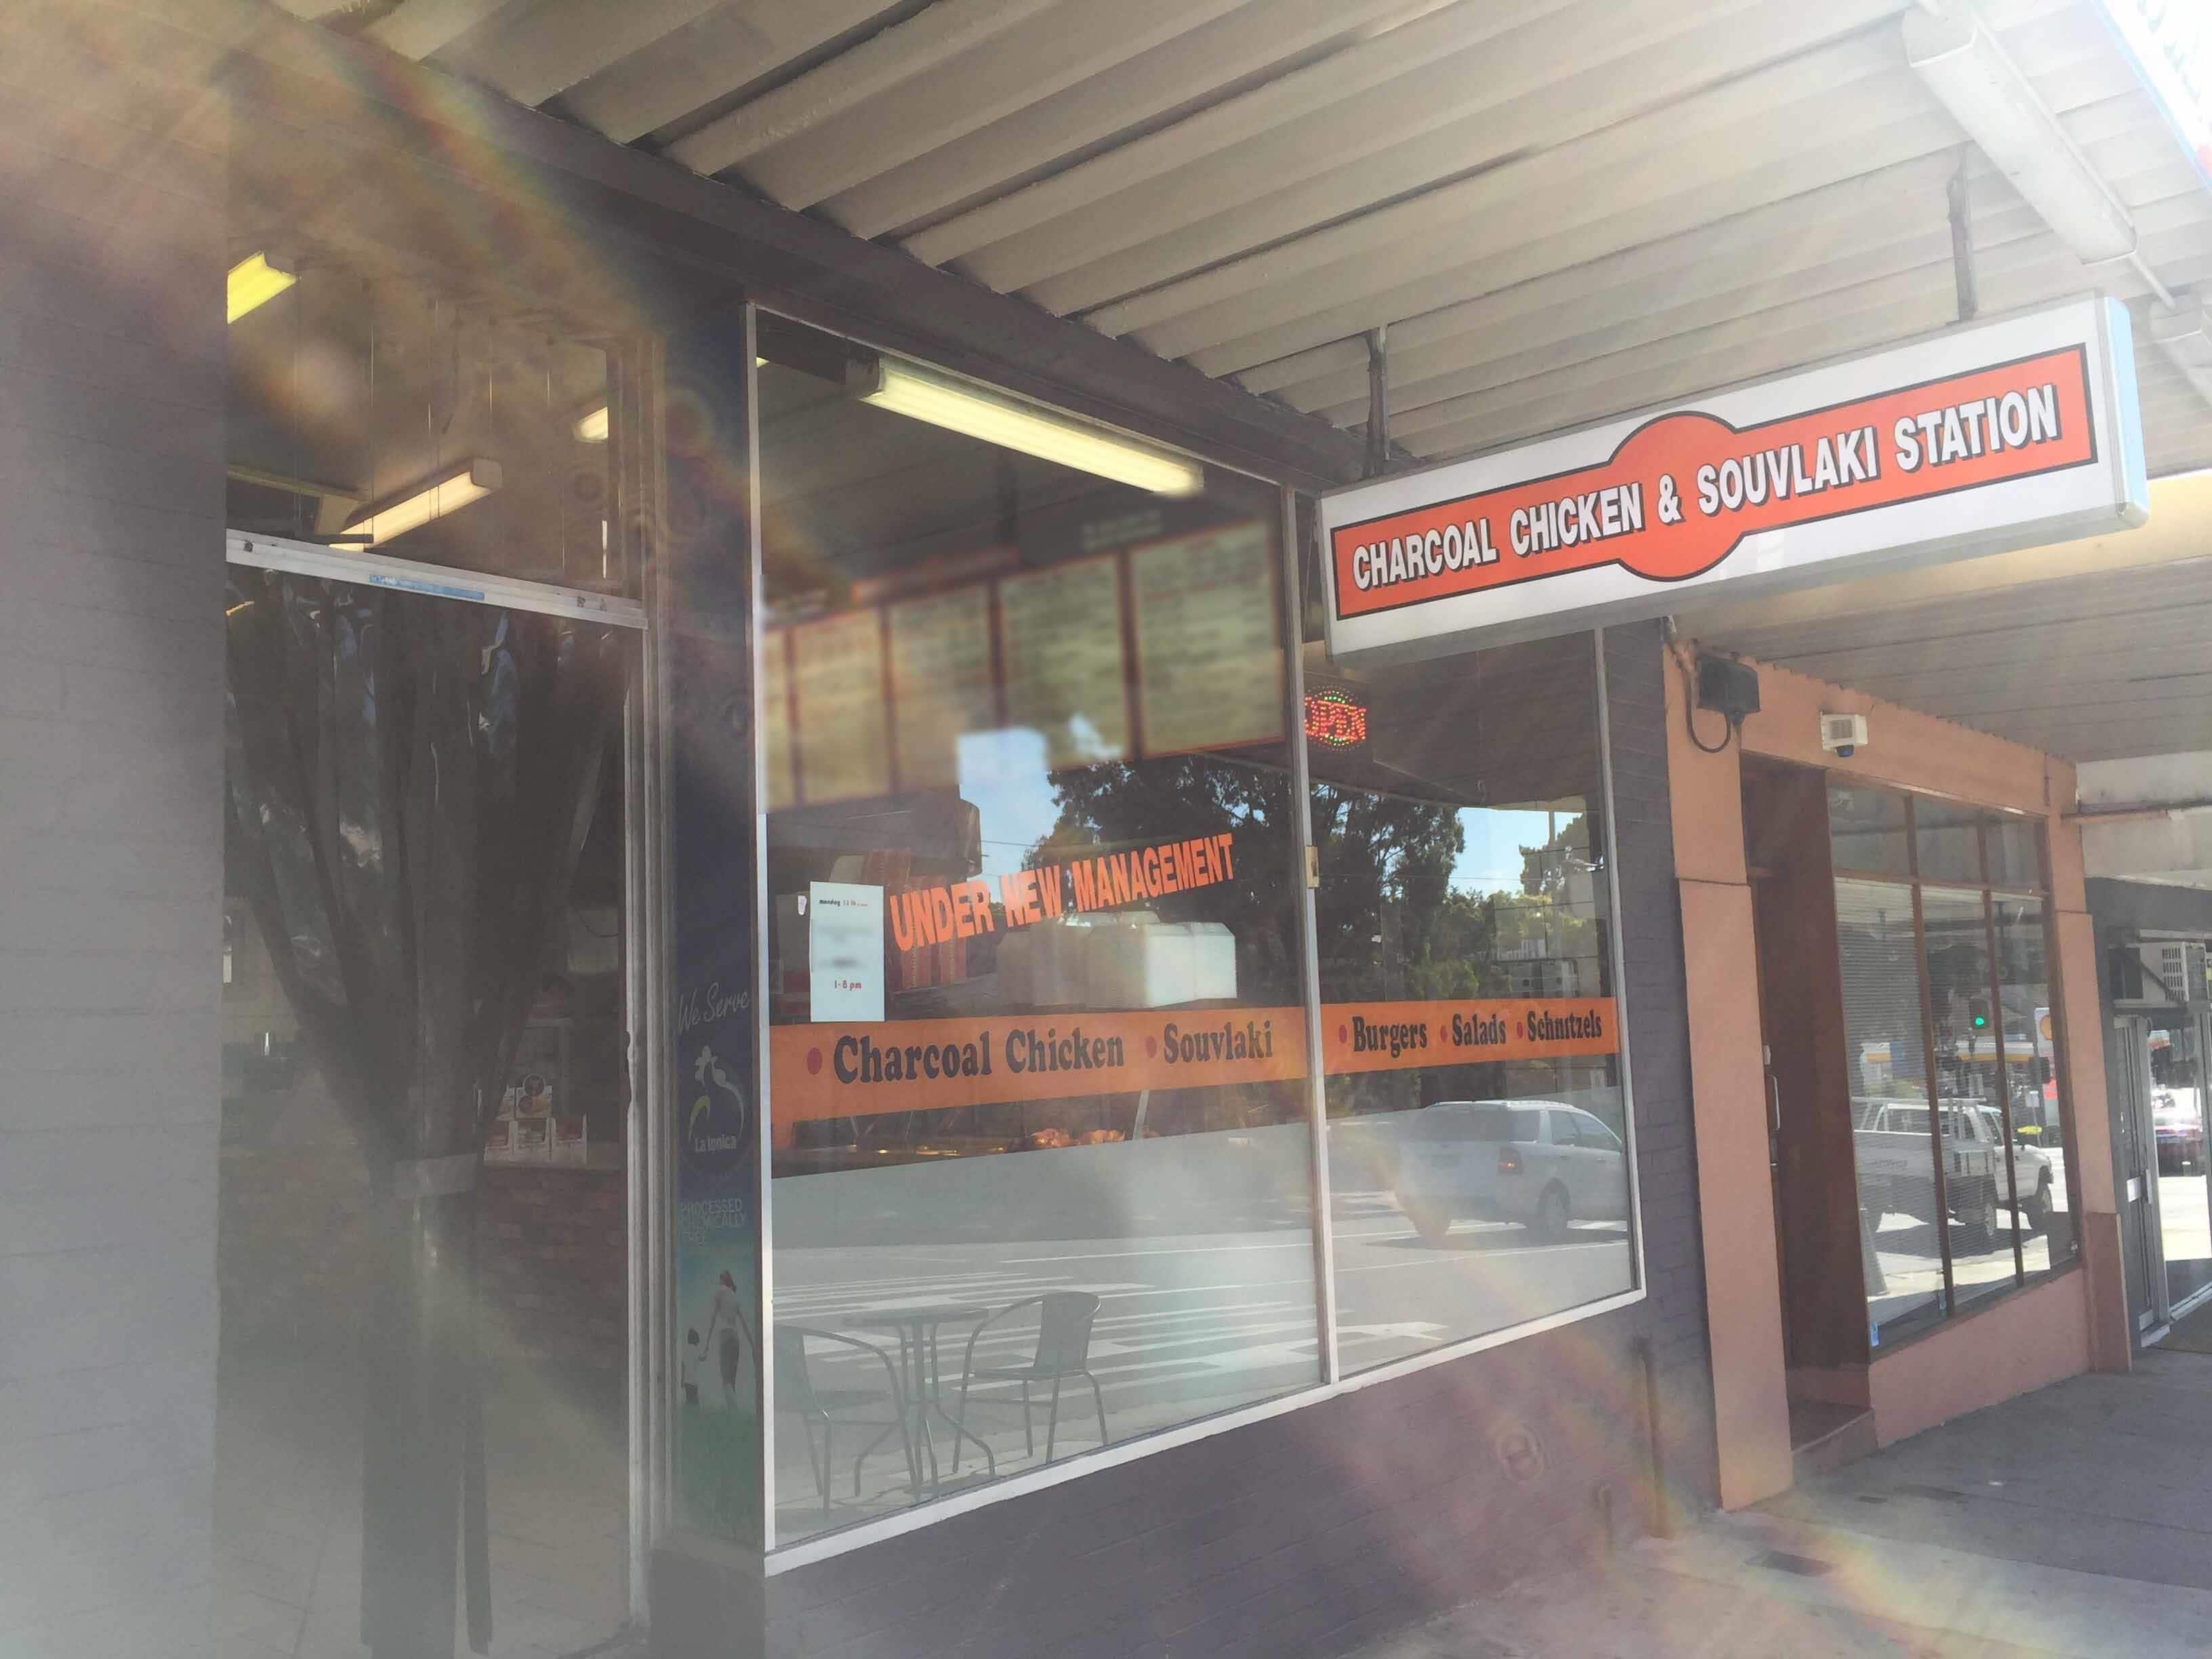 Charcoal Chicken & Souvlaki Station   141 Lower Plenty Road, Rosanna, Victoria 3084   +61 3 9077 3353